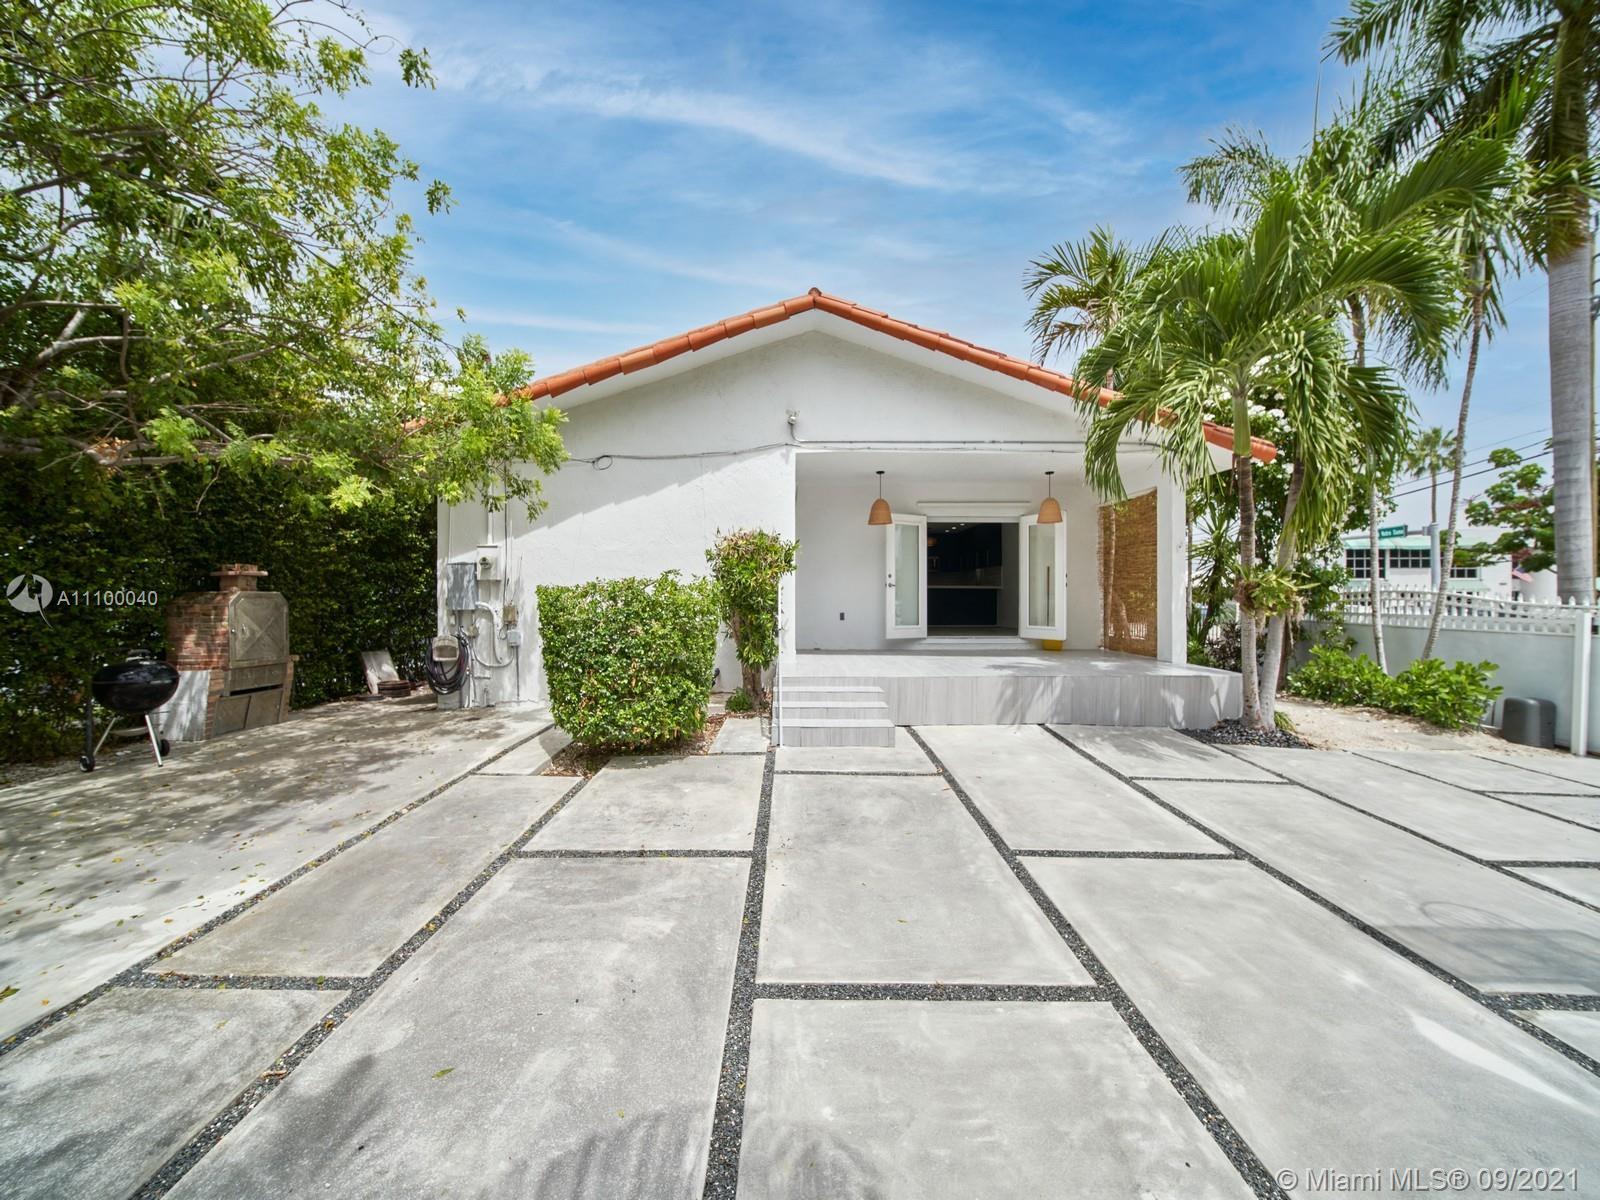 Single Family Home For Rent OCEANSIDE SEC ISLE OF NOR1,519 Sqft